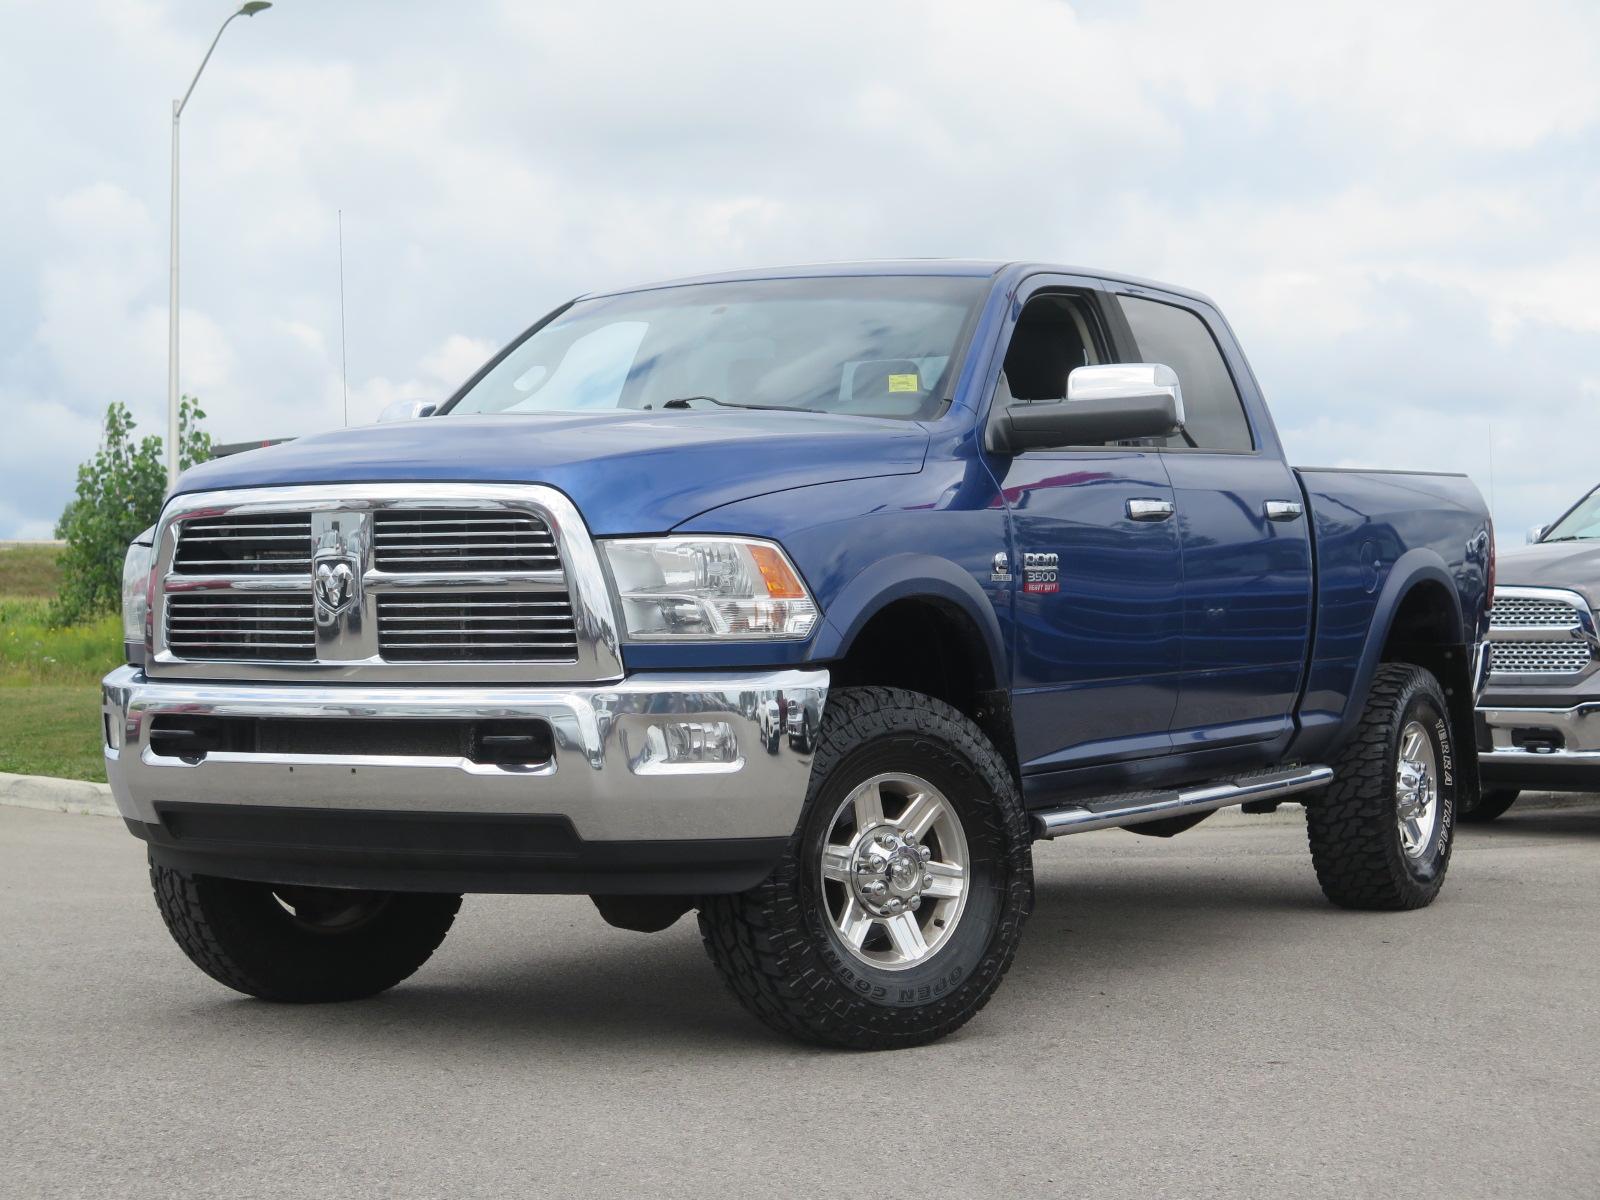 Used 2011 Ram 3500, $40126